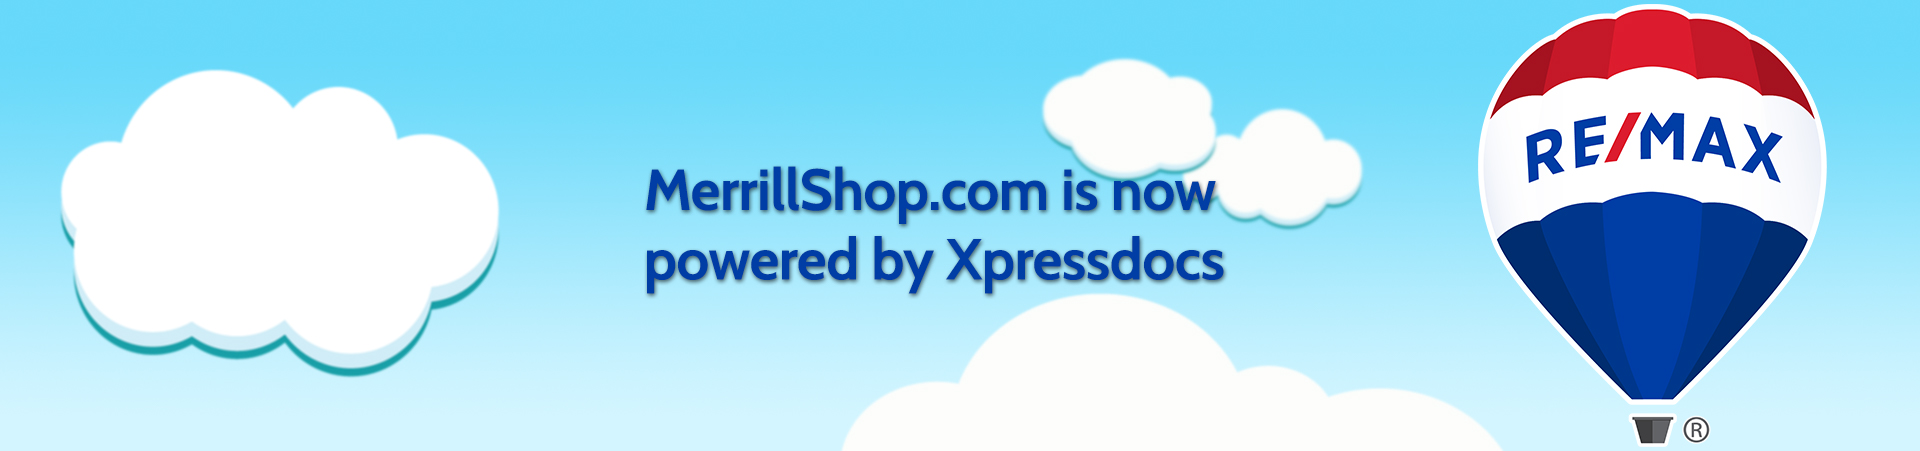 RE/MAX :: Powered by Xpressdocs :: New Account Setup